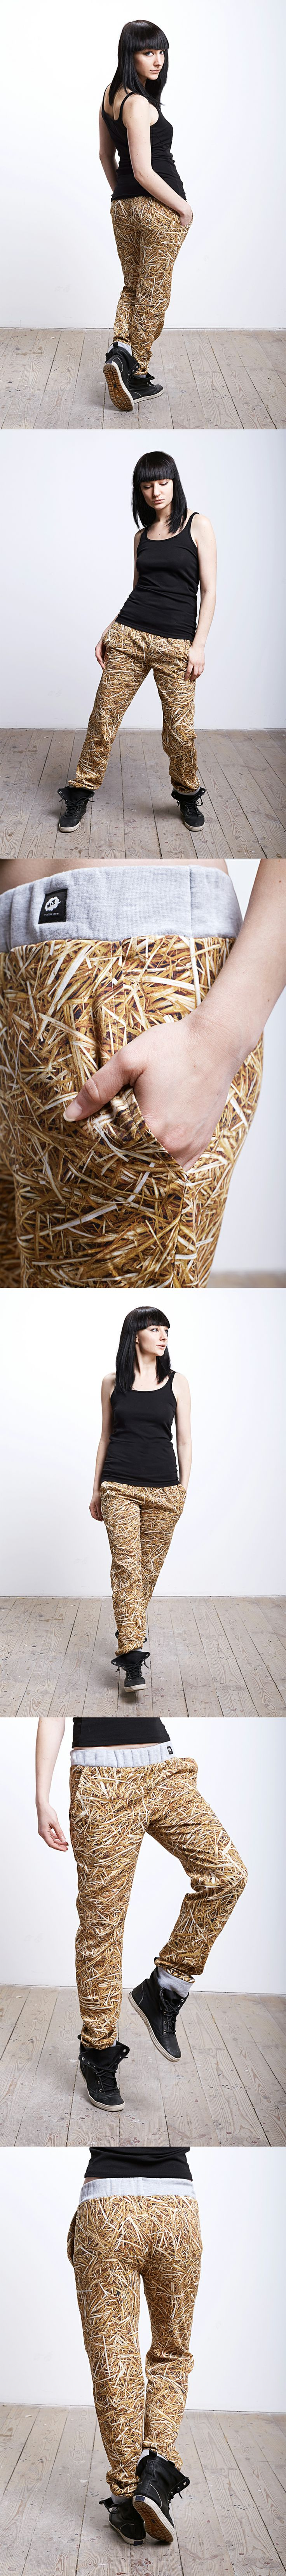 HAY fashion by Dizeno Creative / photo: Piotr Miazga Photography / model: Gosia / www.hayka.eu